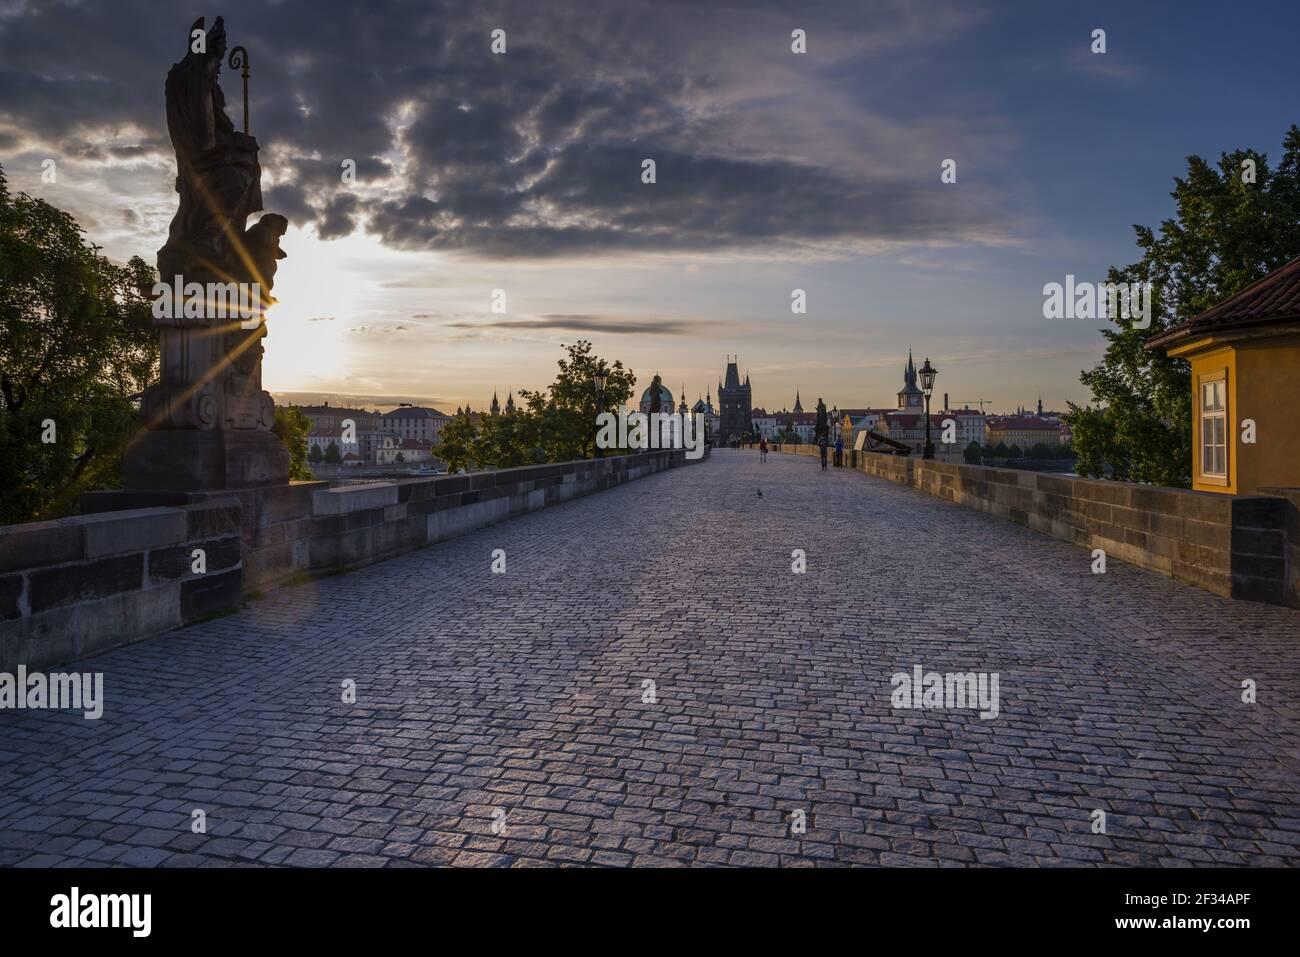 geography / travel, Czechia, Charles Bridge with Old Town bridge tower, UNESCO World Heritage Site, Prague, Czechia, Freedom-Of-Panorama Stock Photo